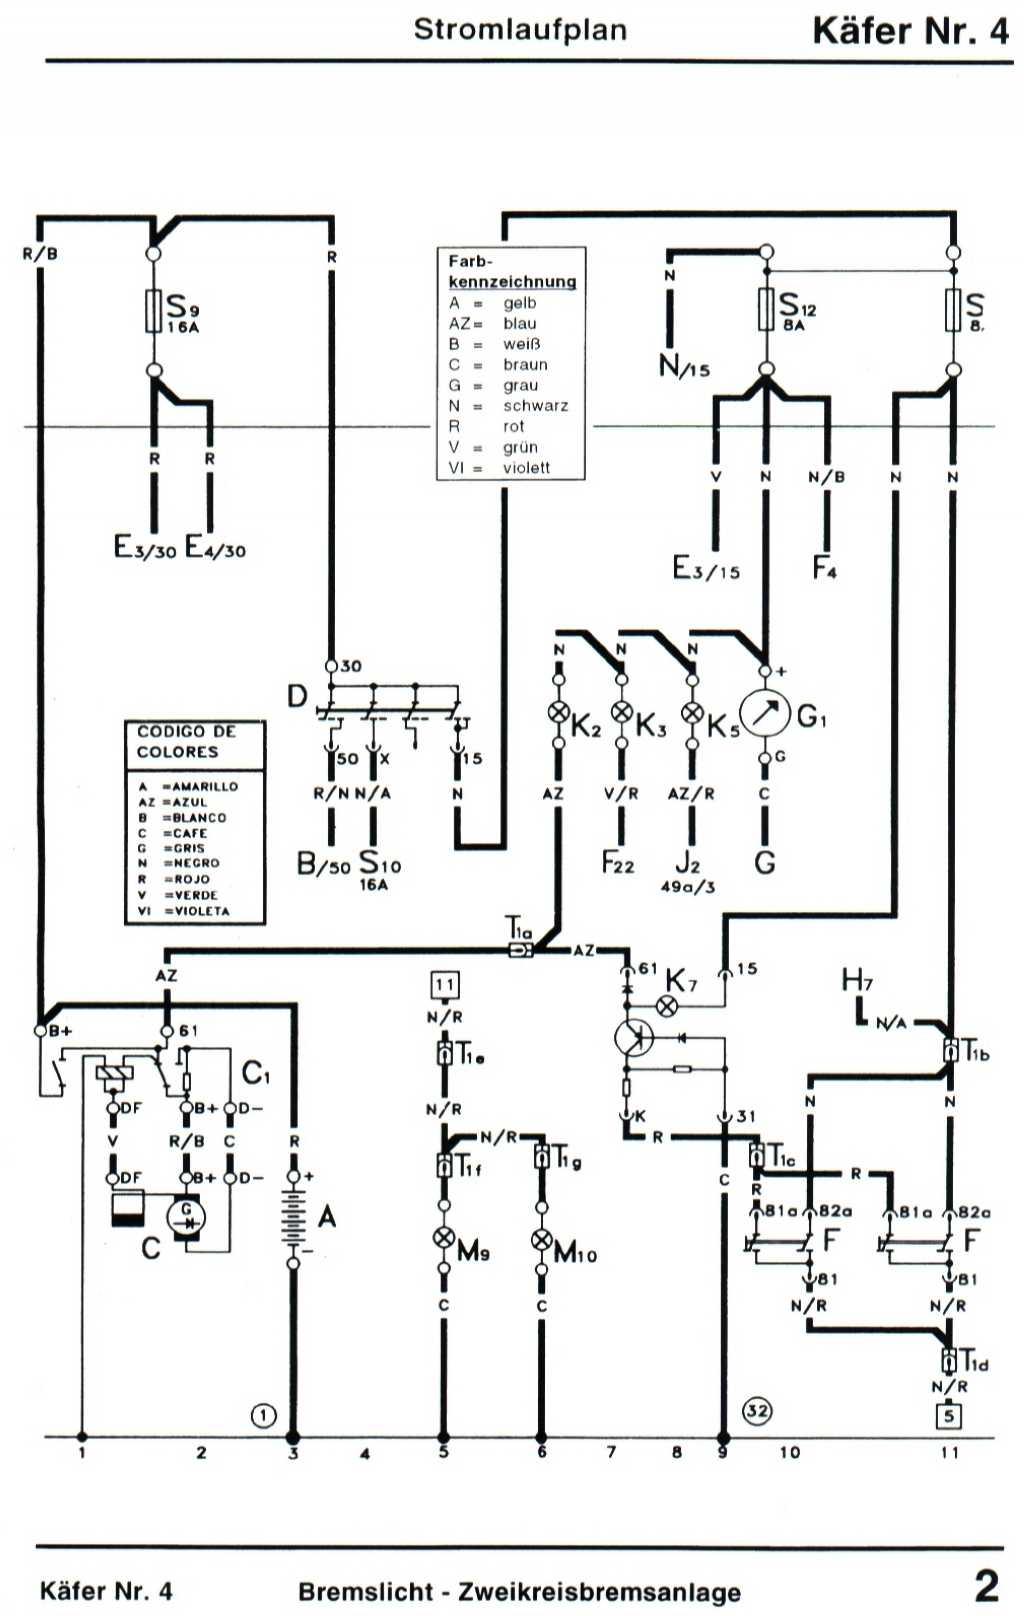 Atemberaubend Vw Käfer Generator Schaltplan Galerie - Schaltplan ...